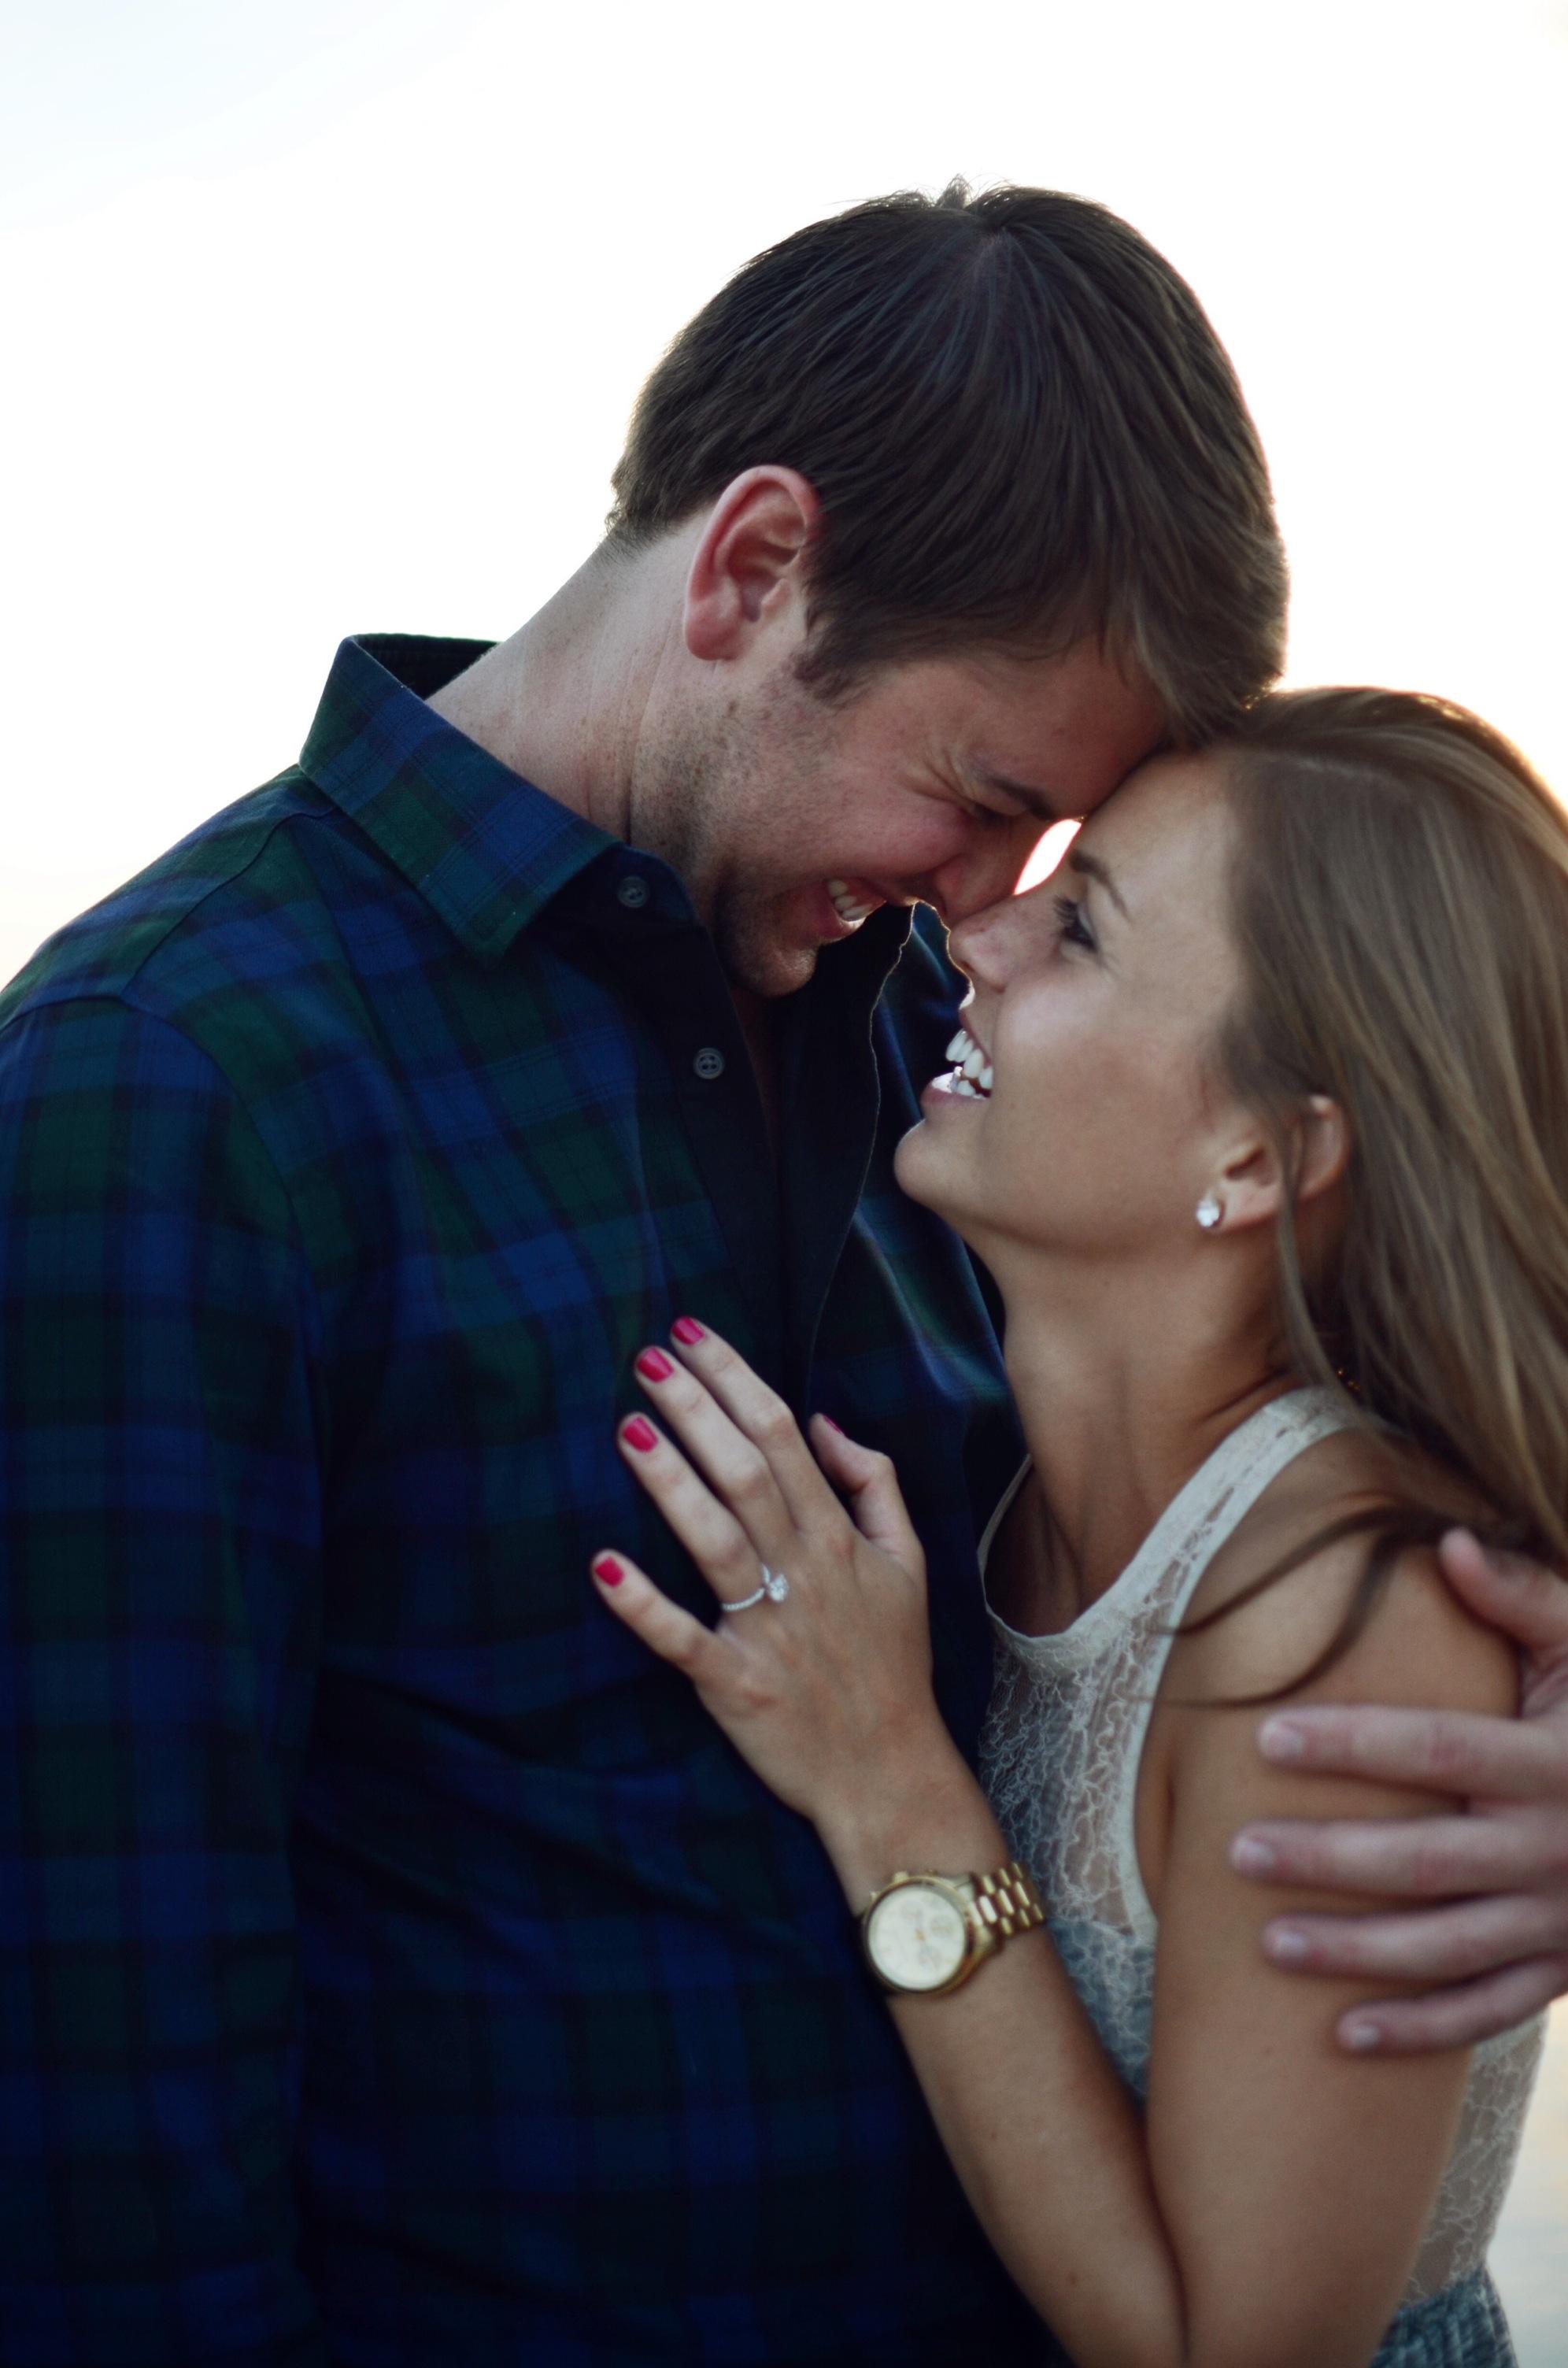 proposal in sarasota_ marriage proposal ideas in florida_image-1